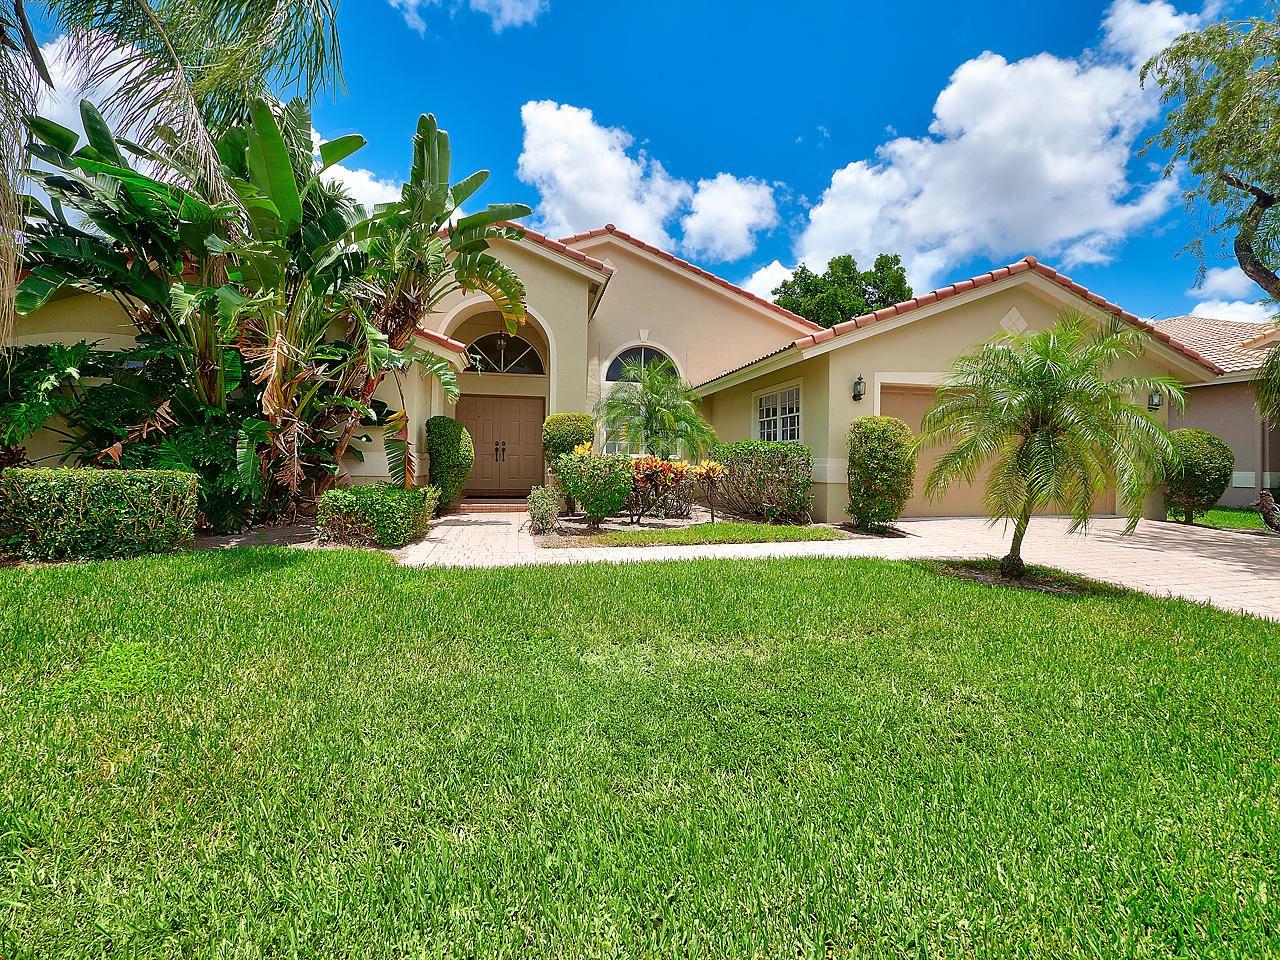 7044 Falls Road E, Boynton Beach, FL 33437 - #: RX-10640806